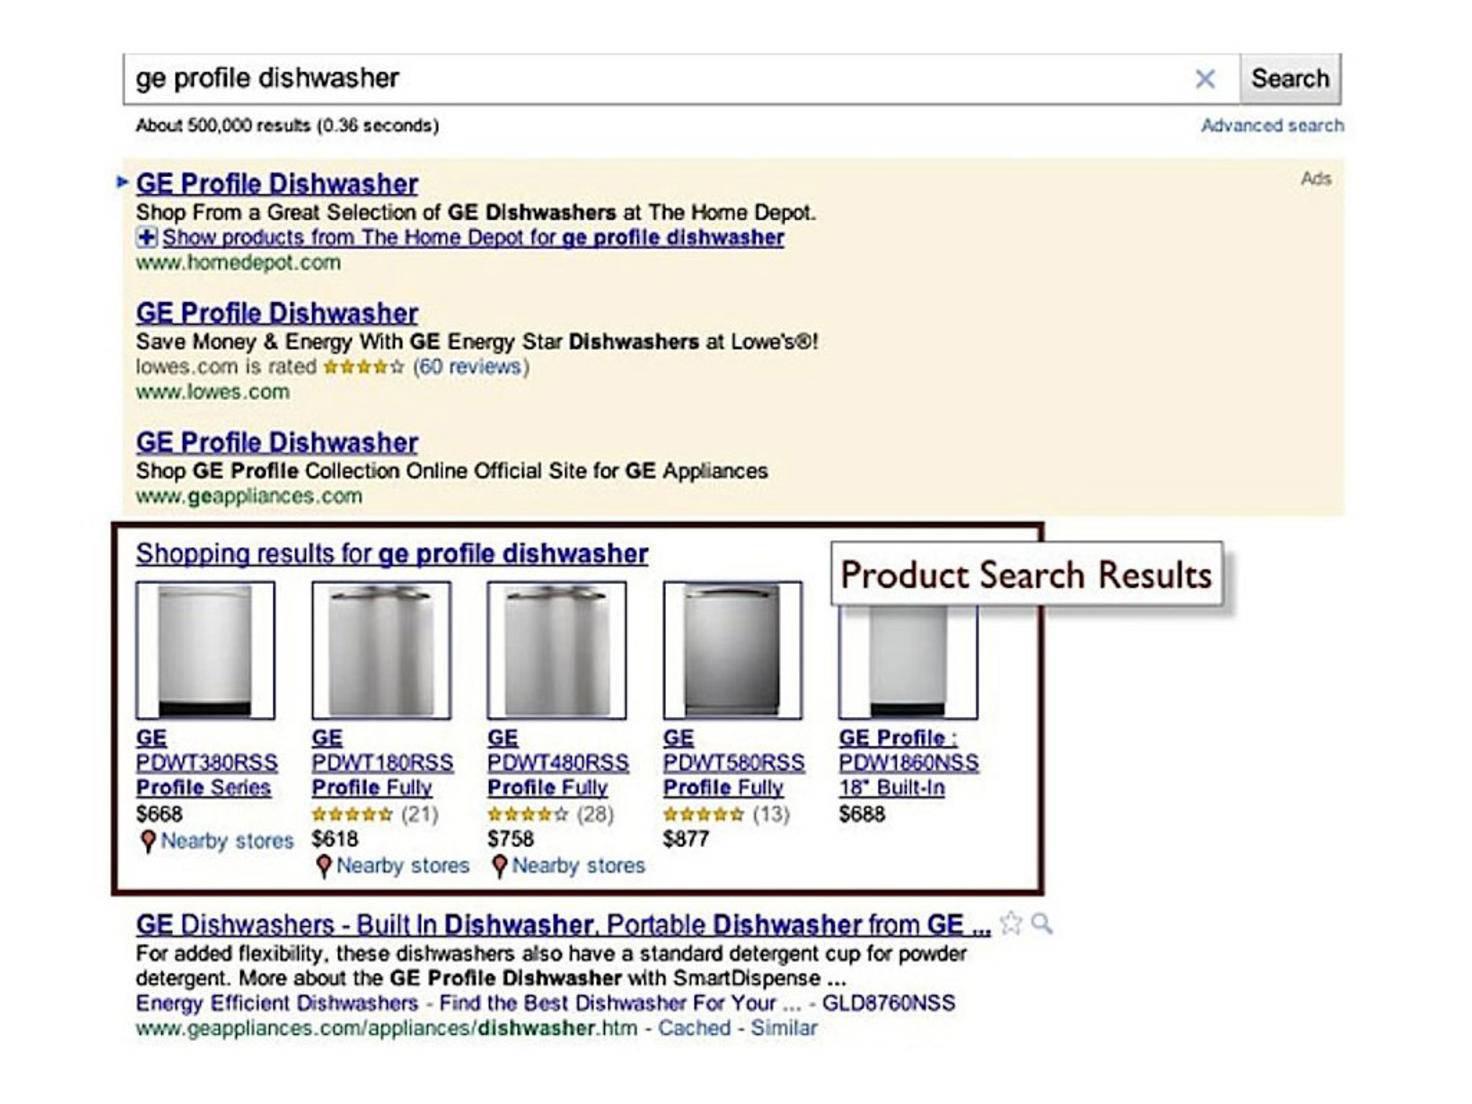 Google 2007 Shopping